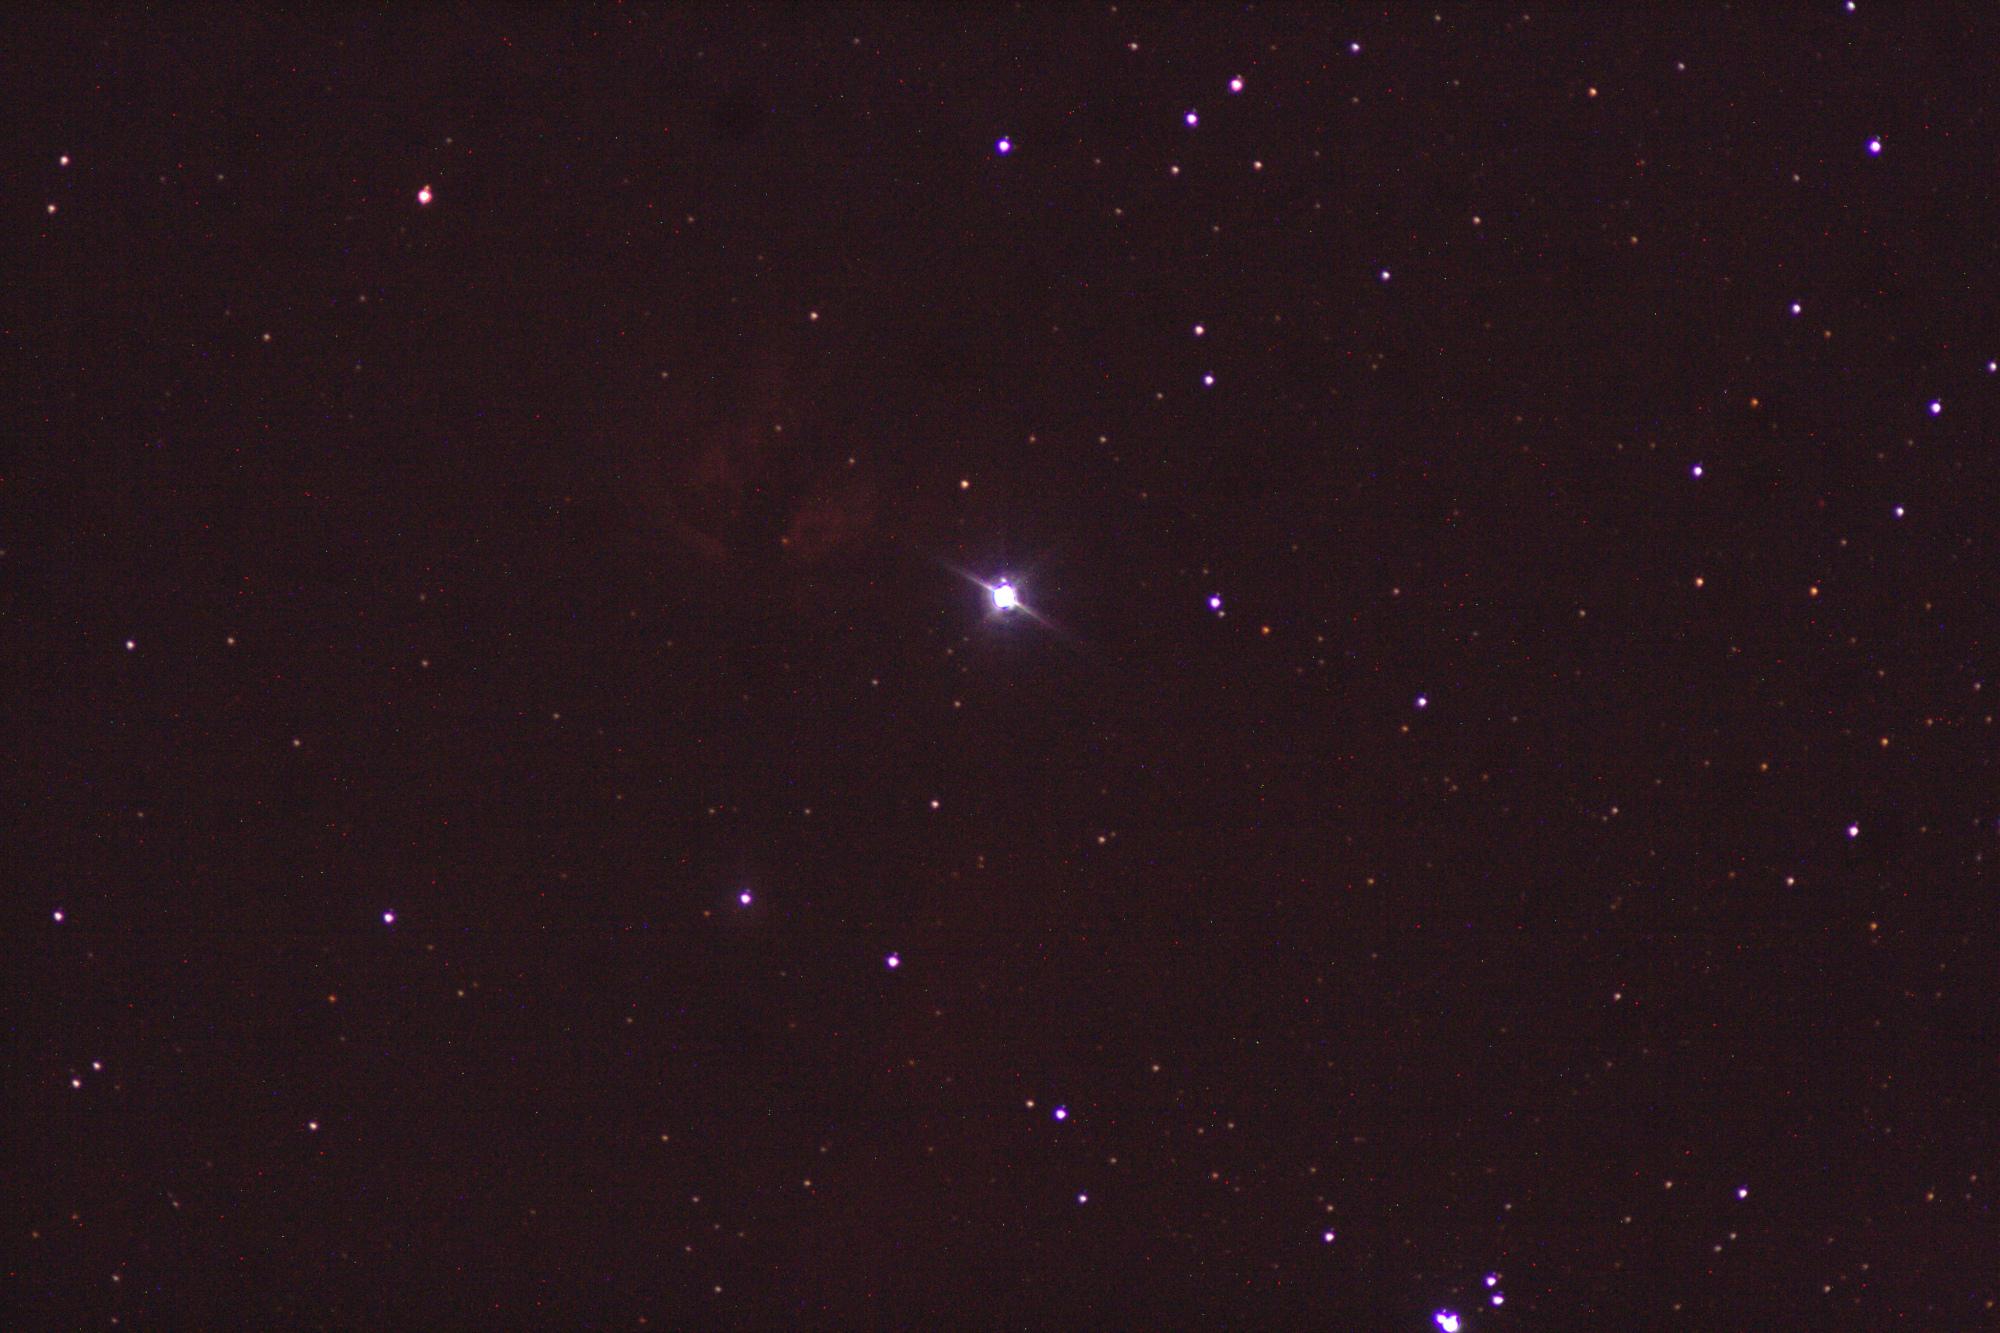 5c6550127836d_NGC202430.thumb.jpg.5e003a4a6b65aea492424905010cd574.jpg